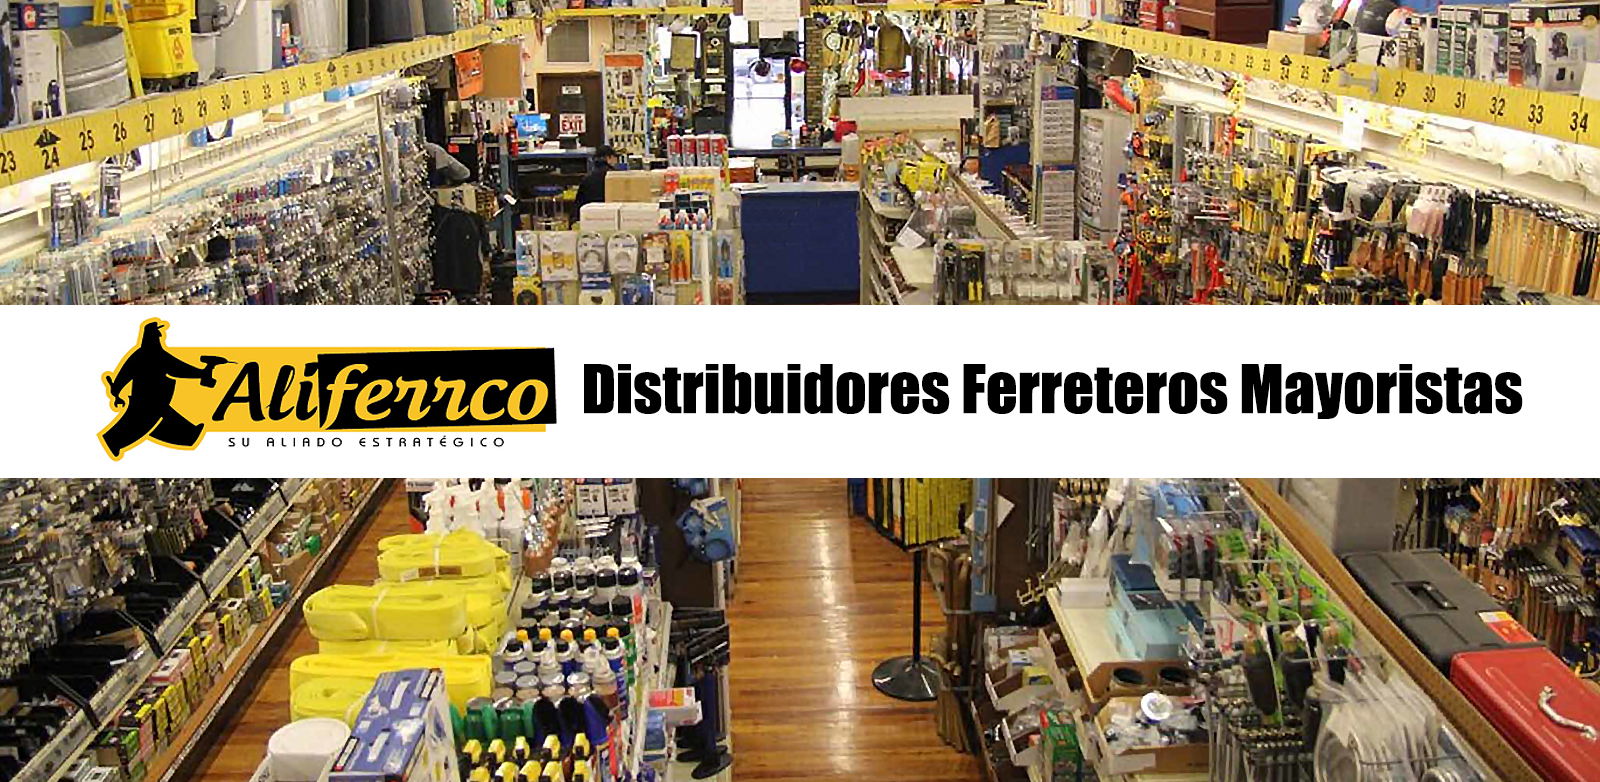 Aliferrco - Distribuidores Ferreteros Mayoristas - Bogota